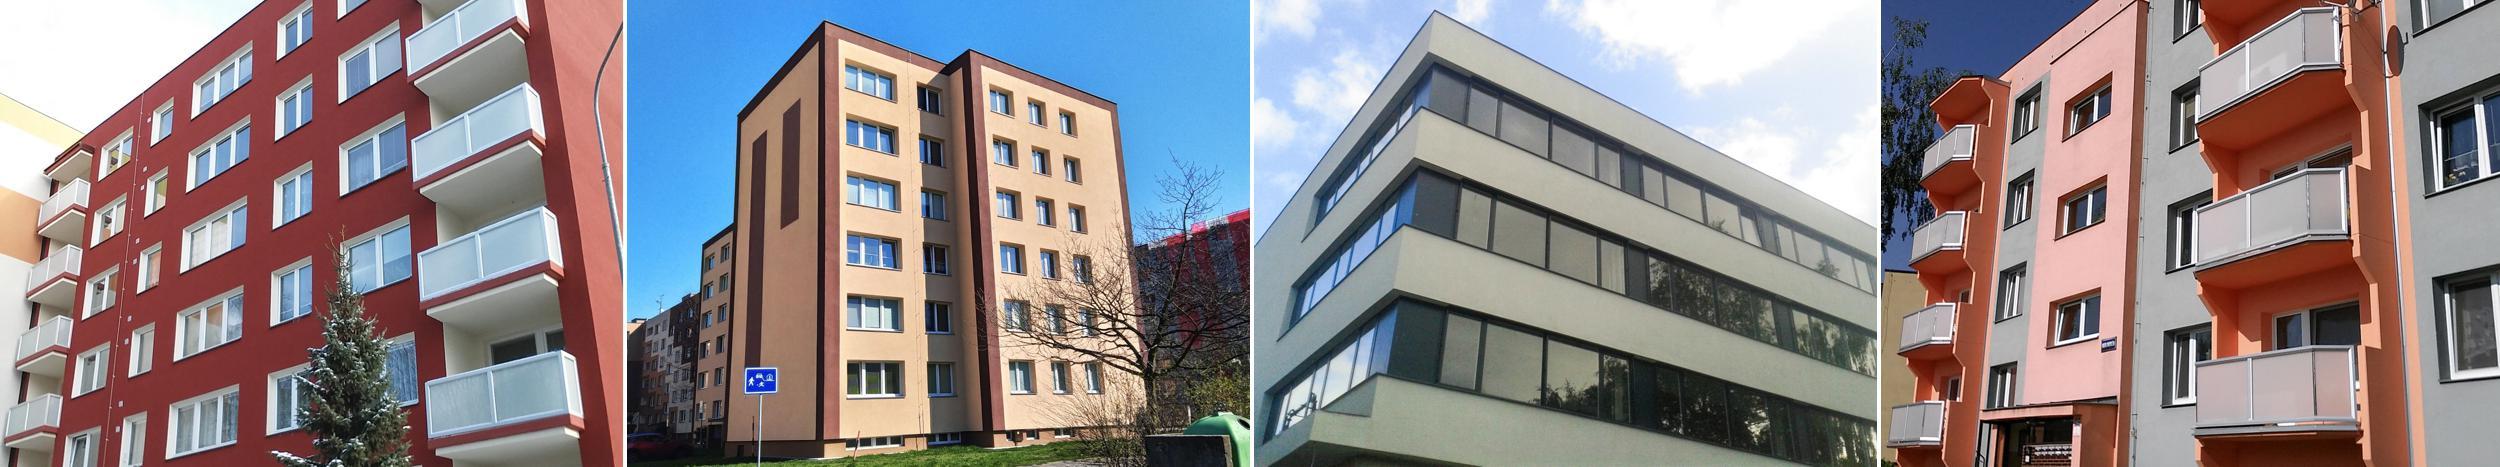 Stavby a rekonstrukce domů a budov Ostarva, Karviná, Havířov